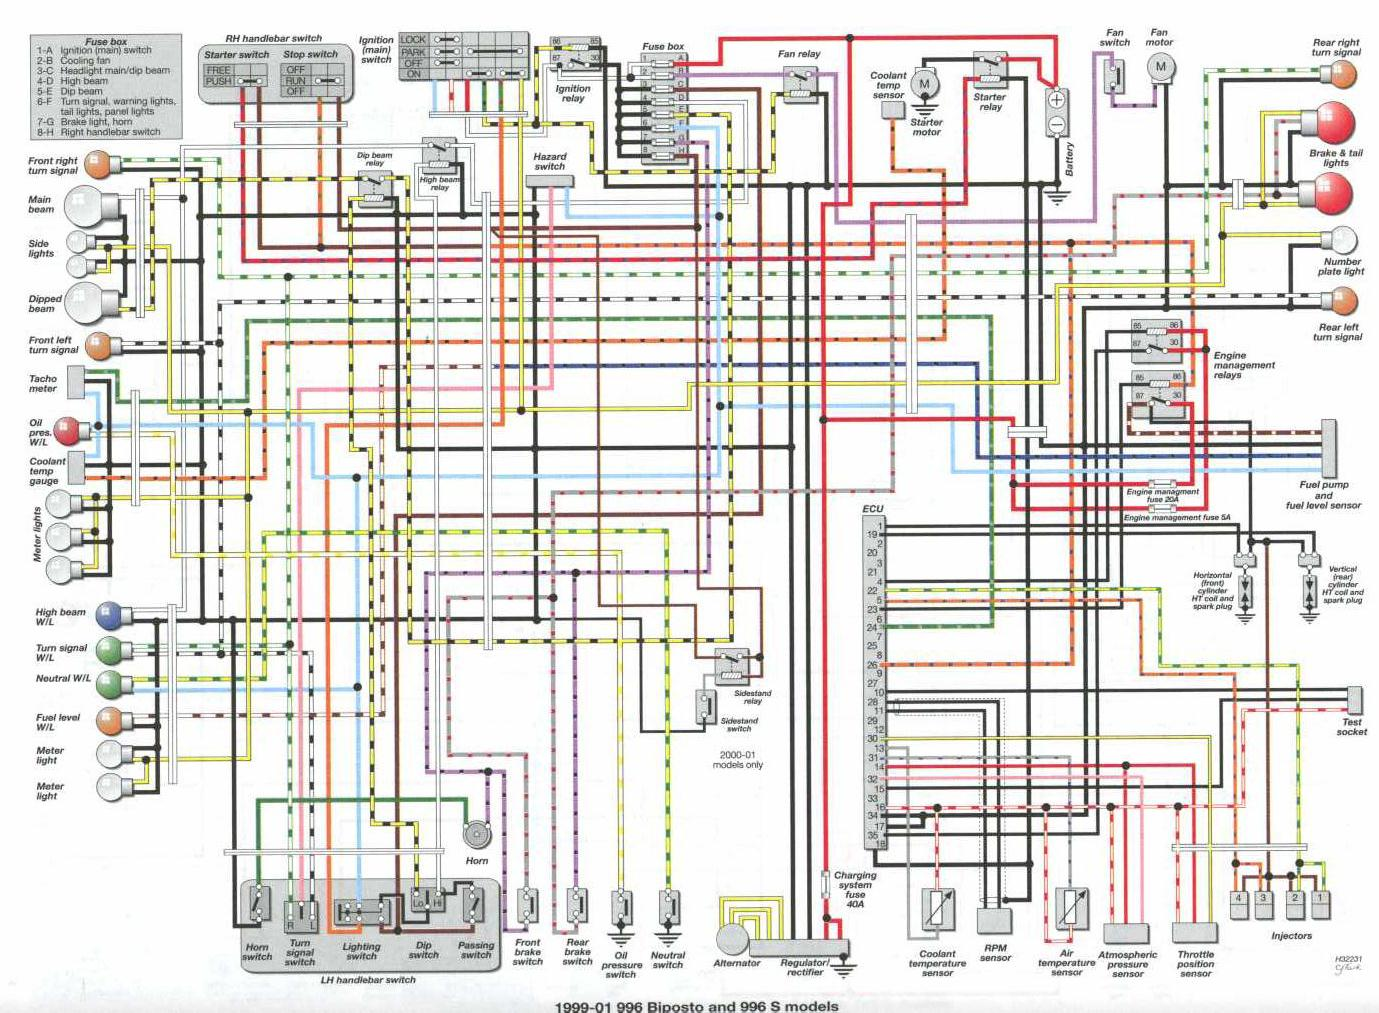 em_1952] ducati 999s wiring diagram ducati 749 wiring diagram ducati monster wiring diagram xempag antus rimen arcin chor orsal lite dogan gray bocep ...